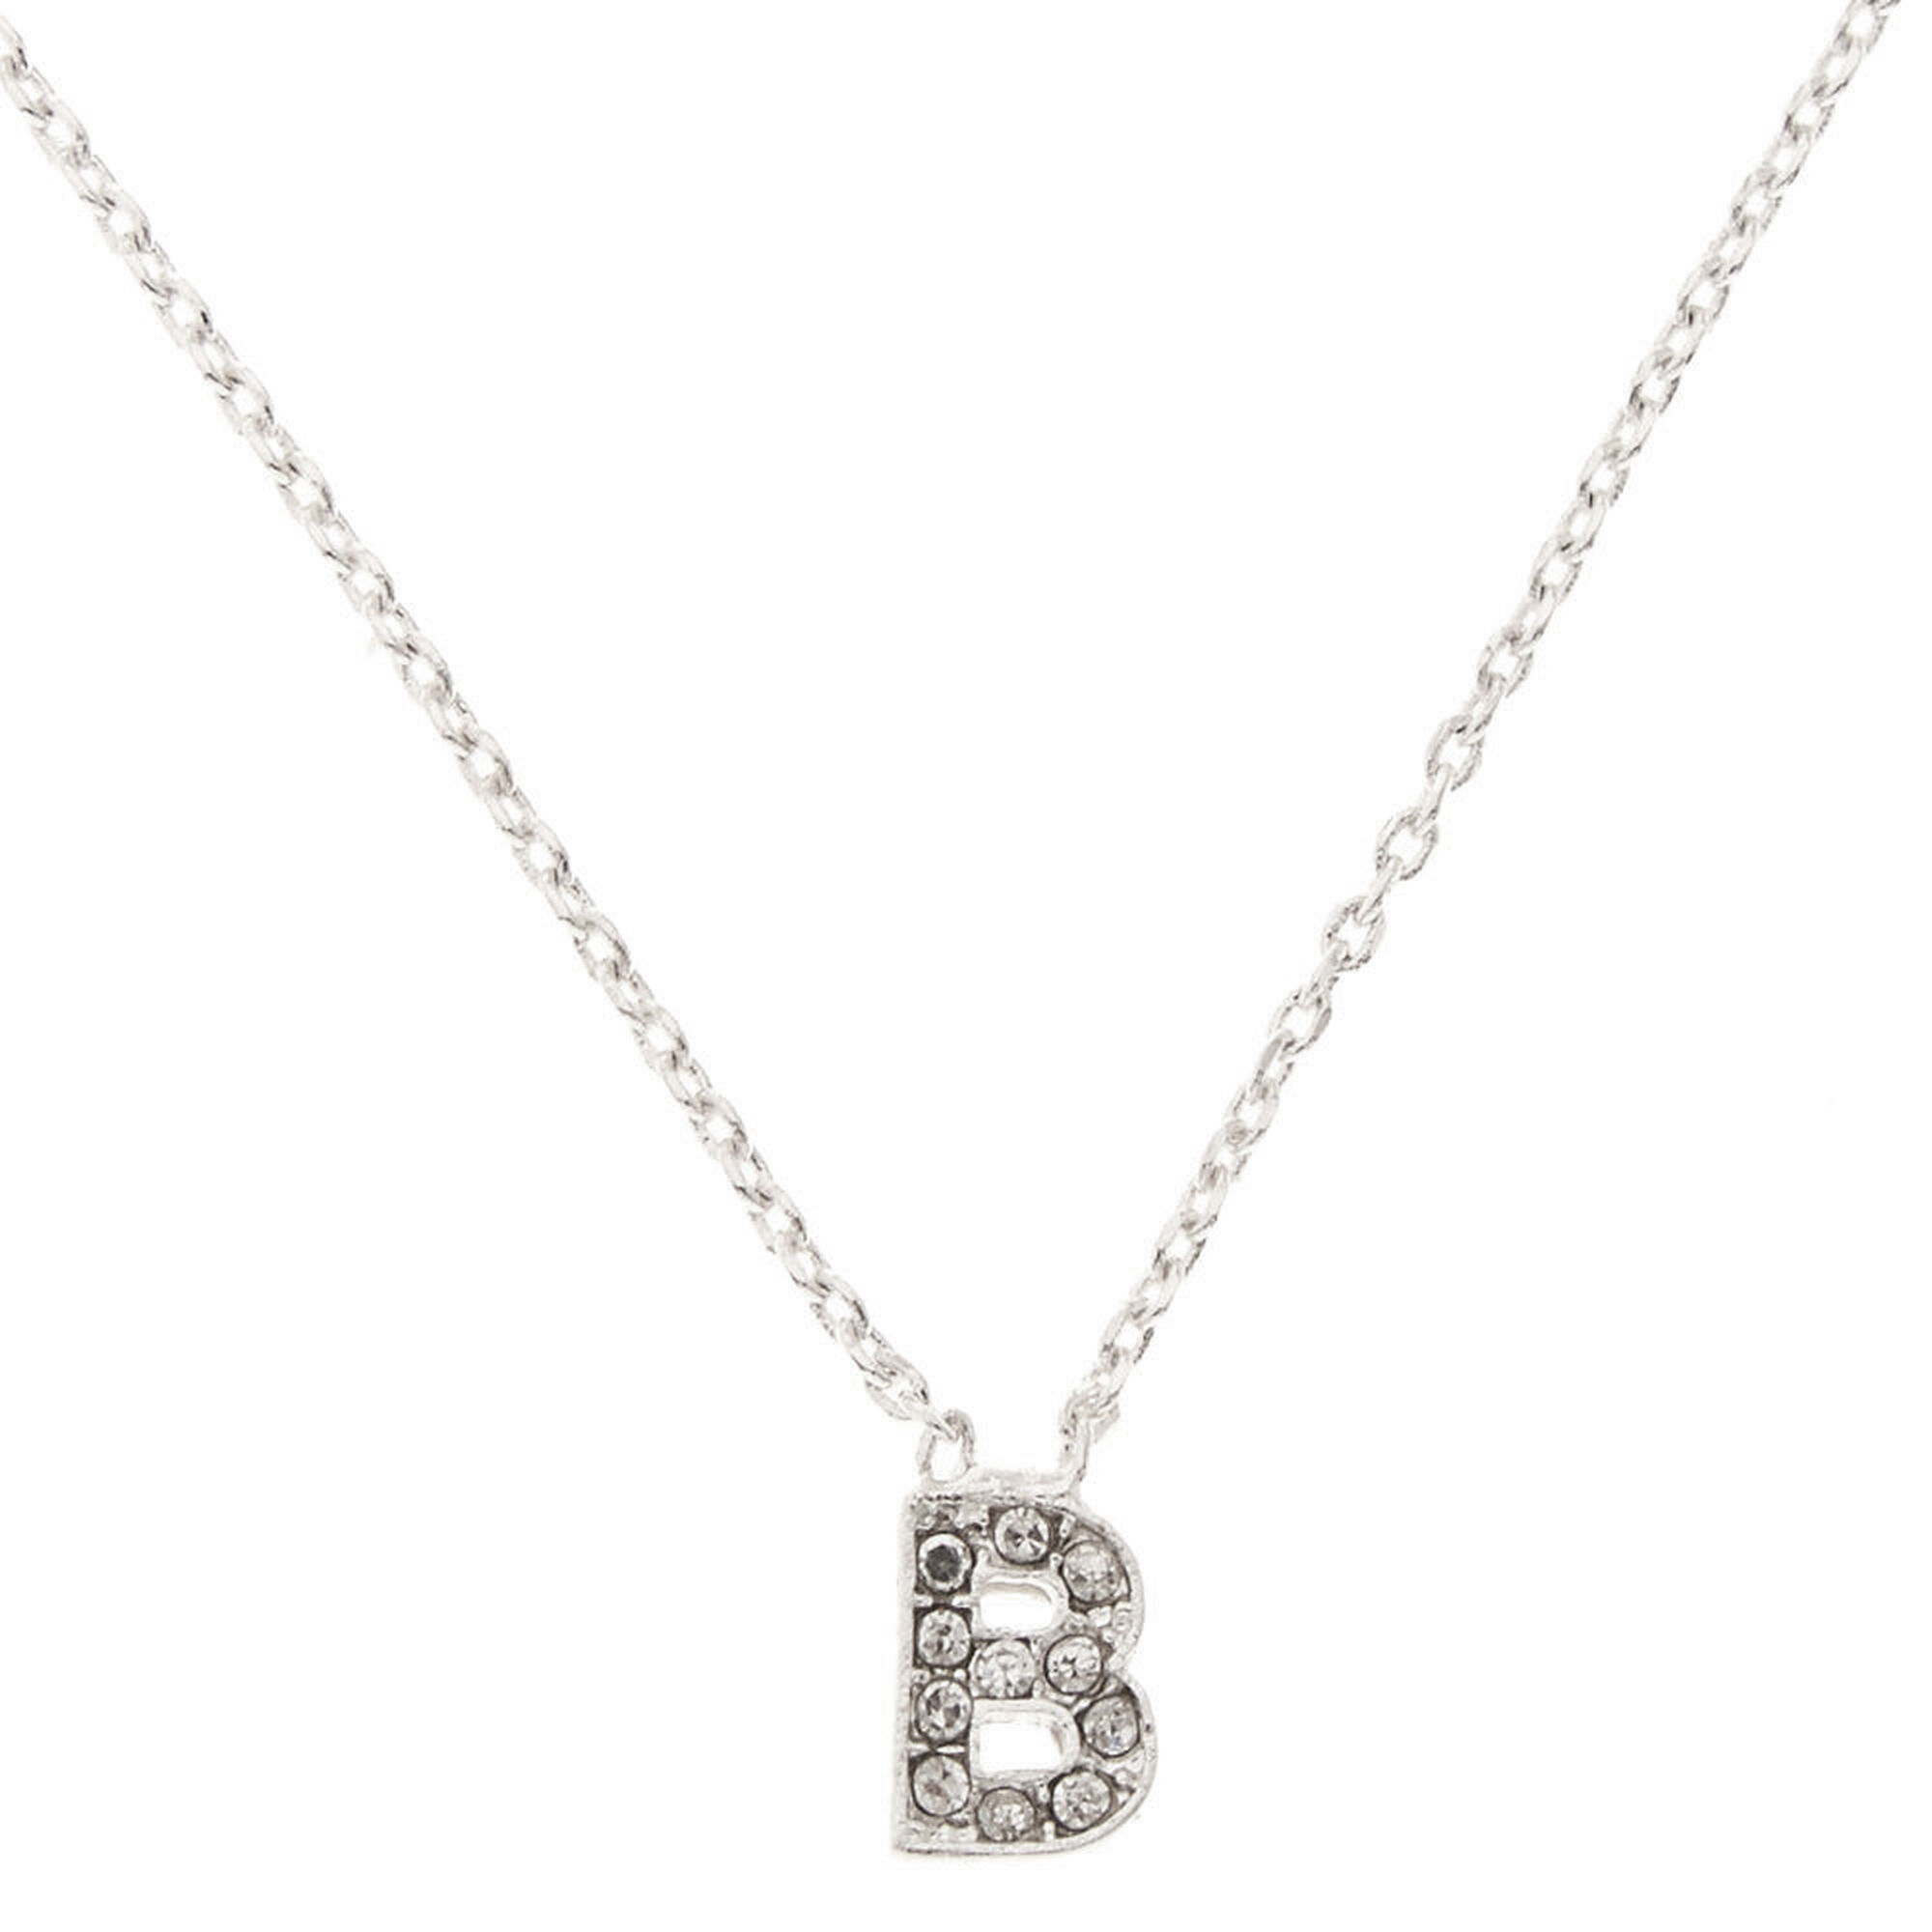 Silver tone b initial pendant necklace claires us silver tone quotbquot mozeypictures Choice Image